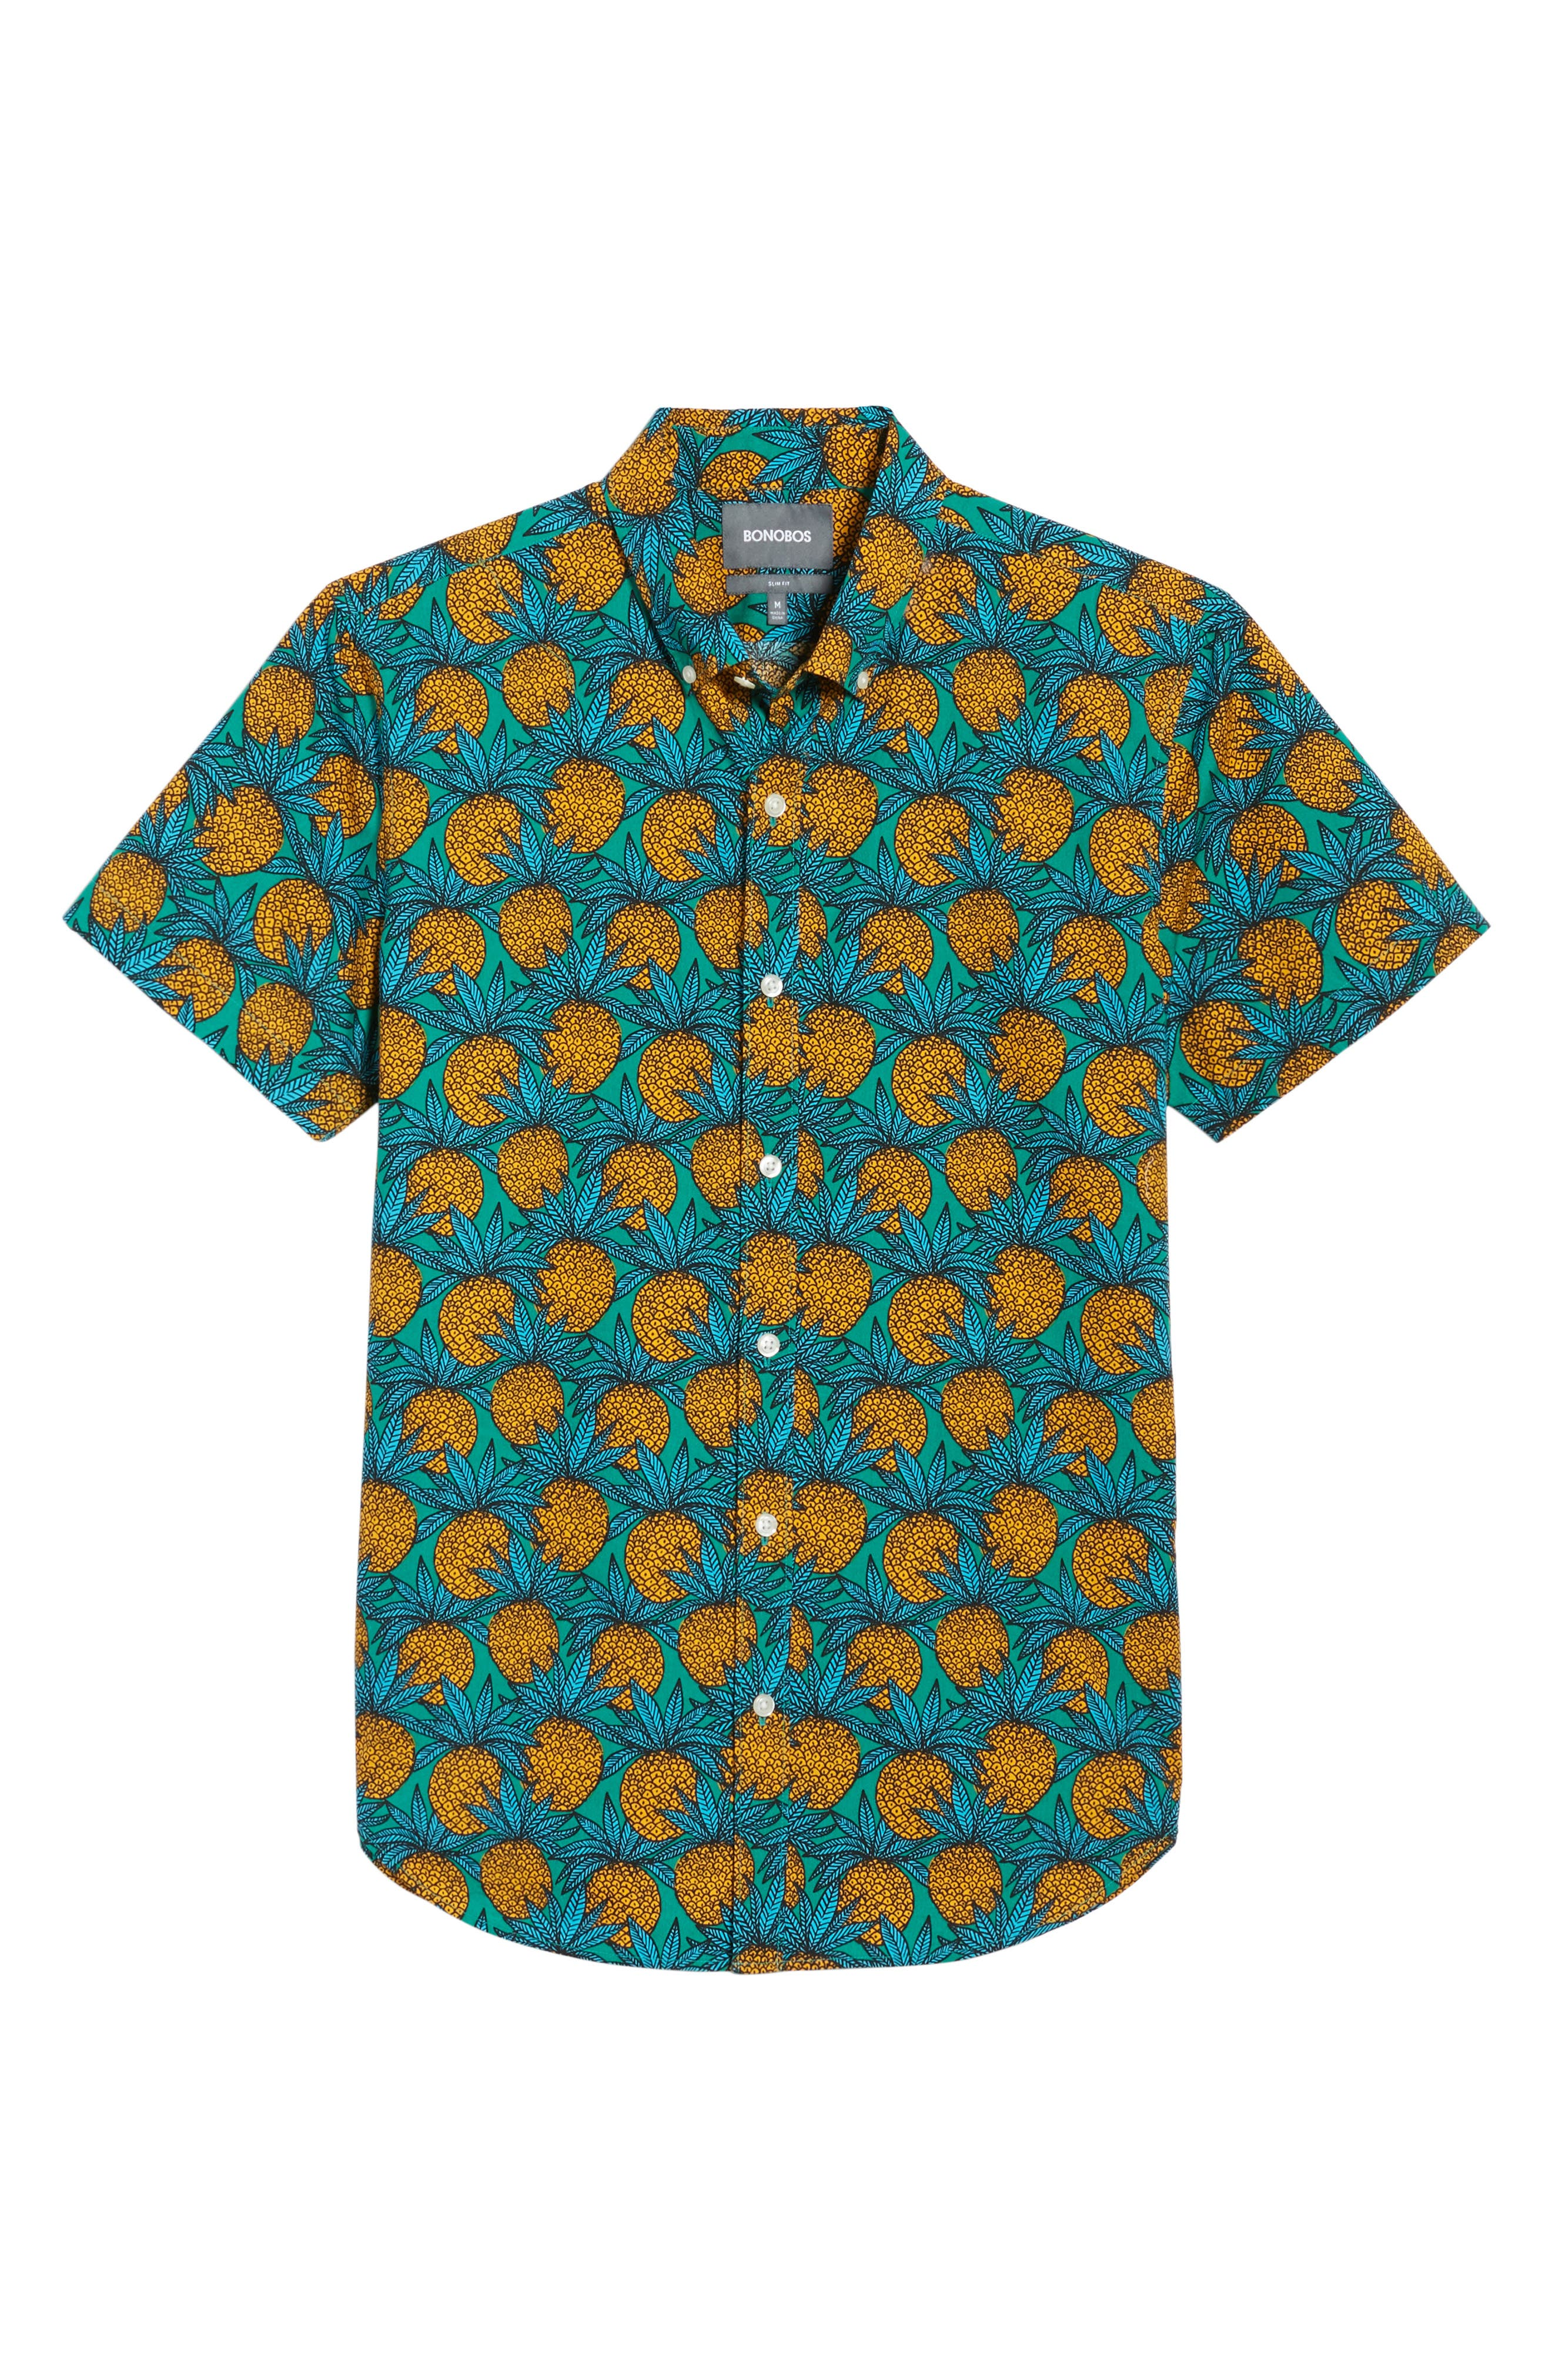 Slim Fit Print Short Sleeve Sport Shirt,                             Alternate thumbnail 6, color,                             Pineapple Fields - Lush Meadow